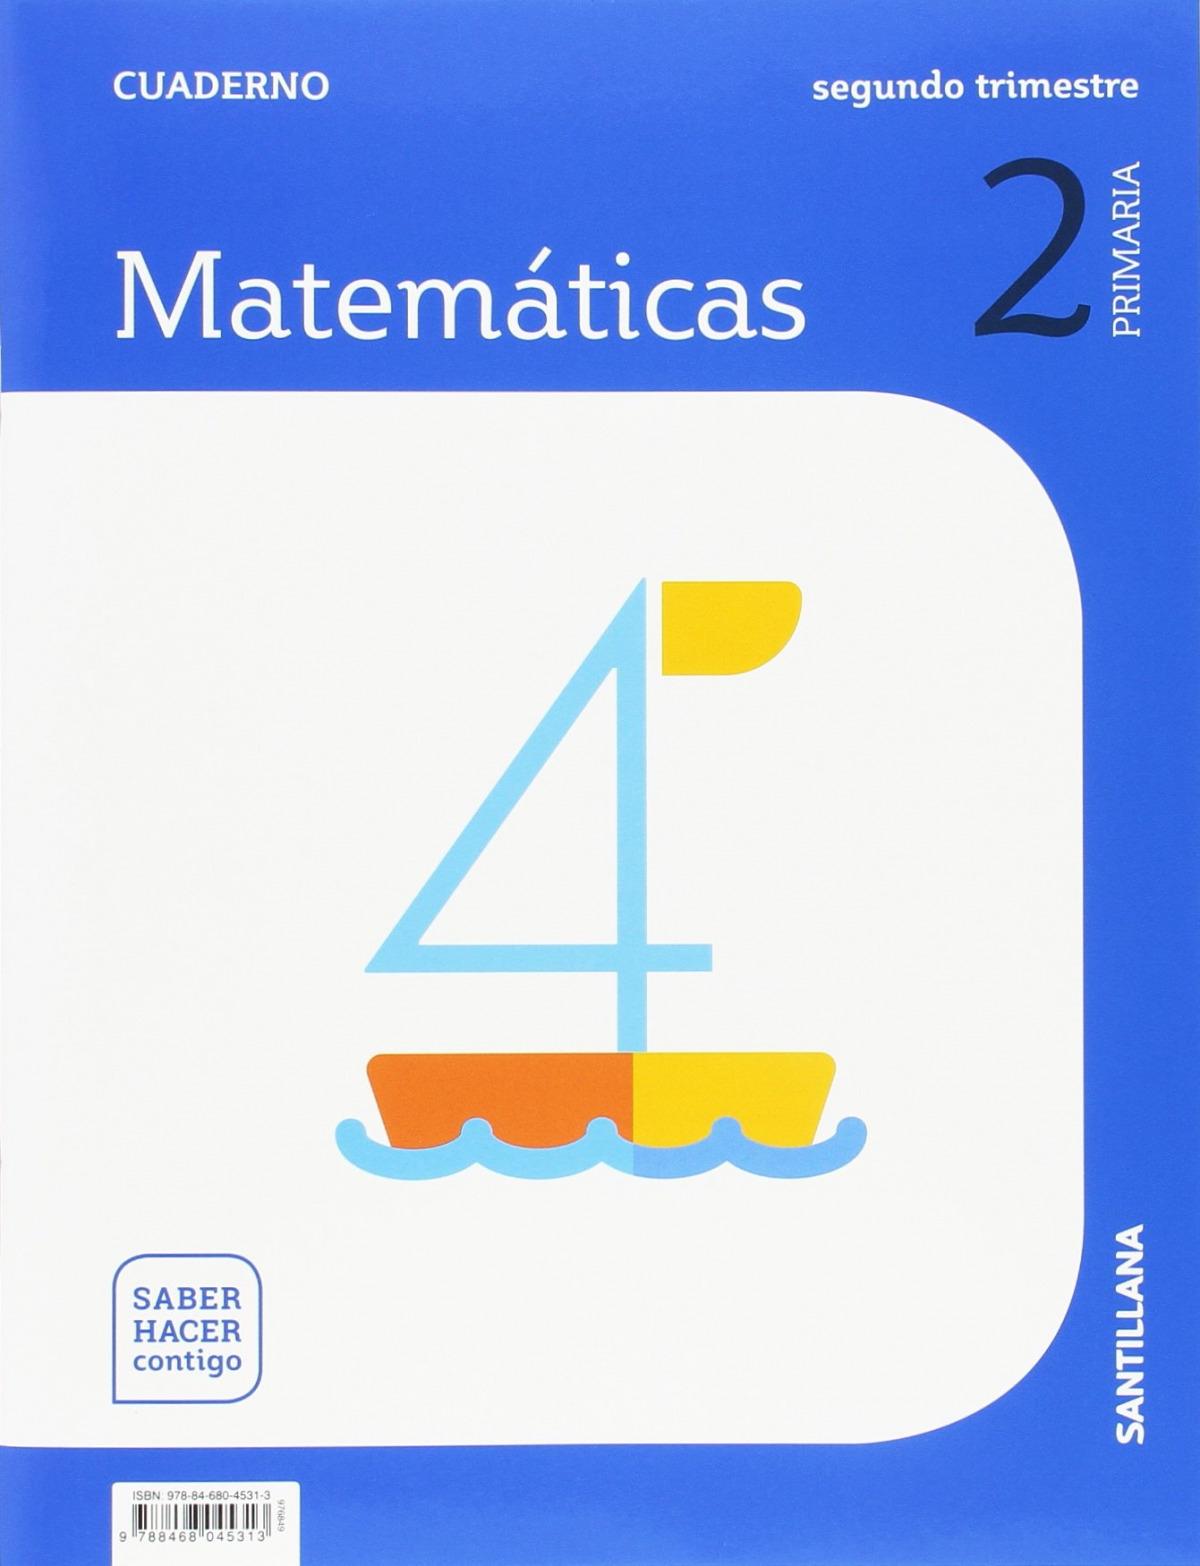 CUADERNO MATEMÁTICAS 2-2o.PRIMARIA. SABER HACER CONTIGO 9788468045313